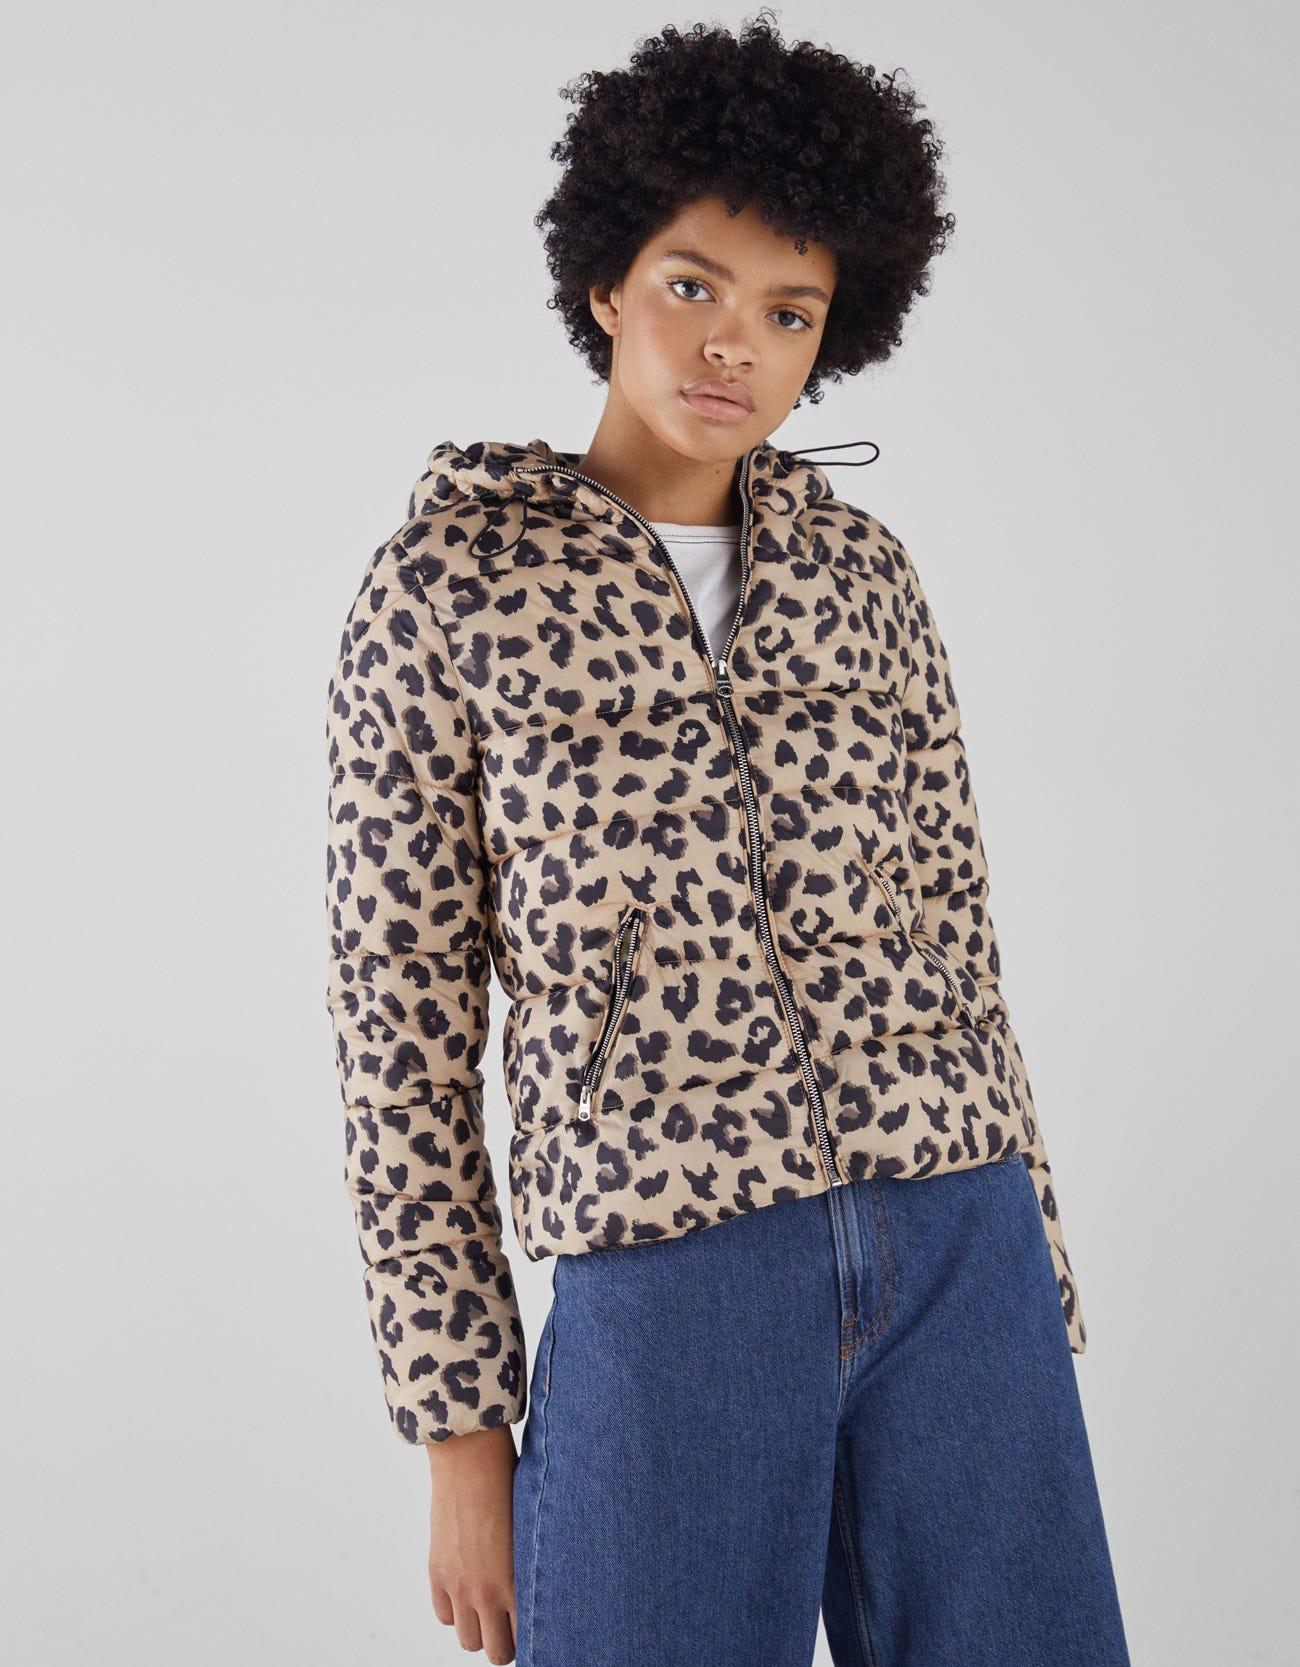 e2159d1c4255 Best Leopard Print Coats To Keep You Warm Winter 2018